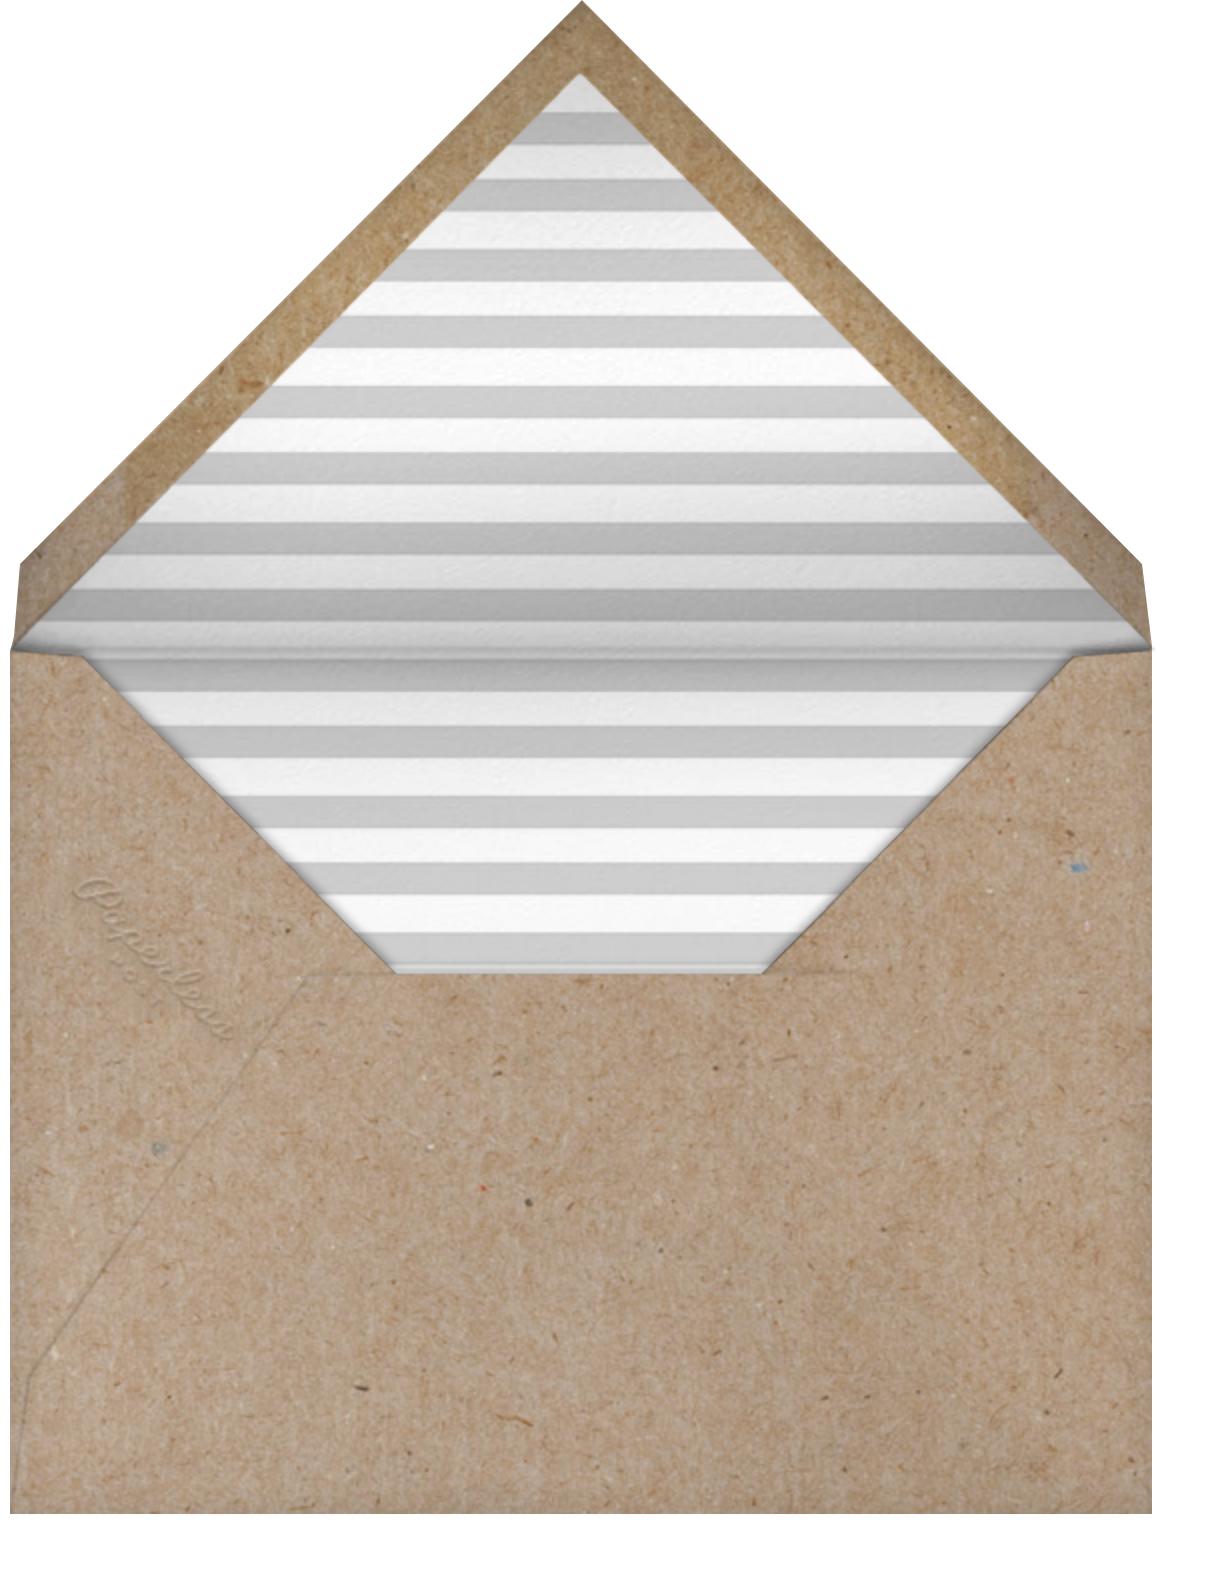 Polka Dot Baby (Thank You) - Gray - The Indigo Bunting - Alicia's Test - envelope back